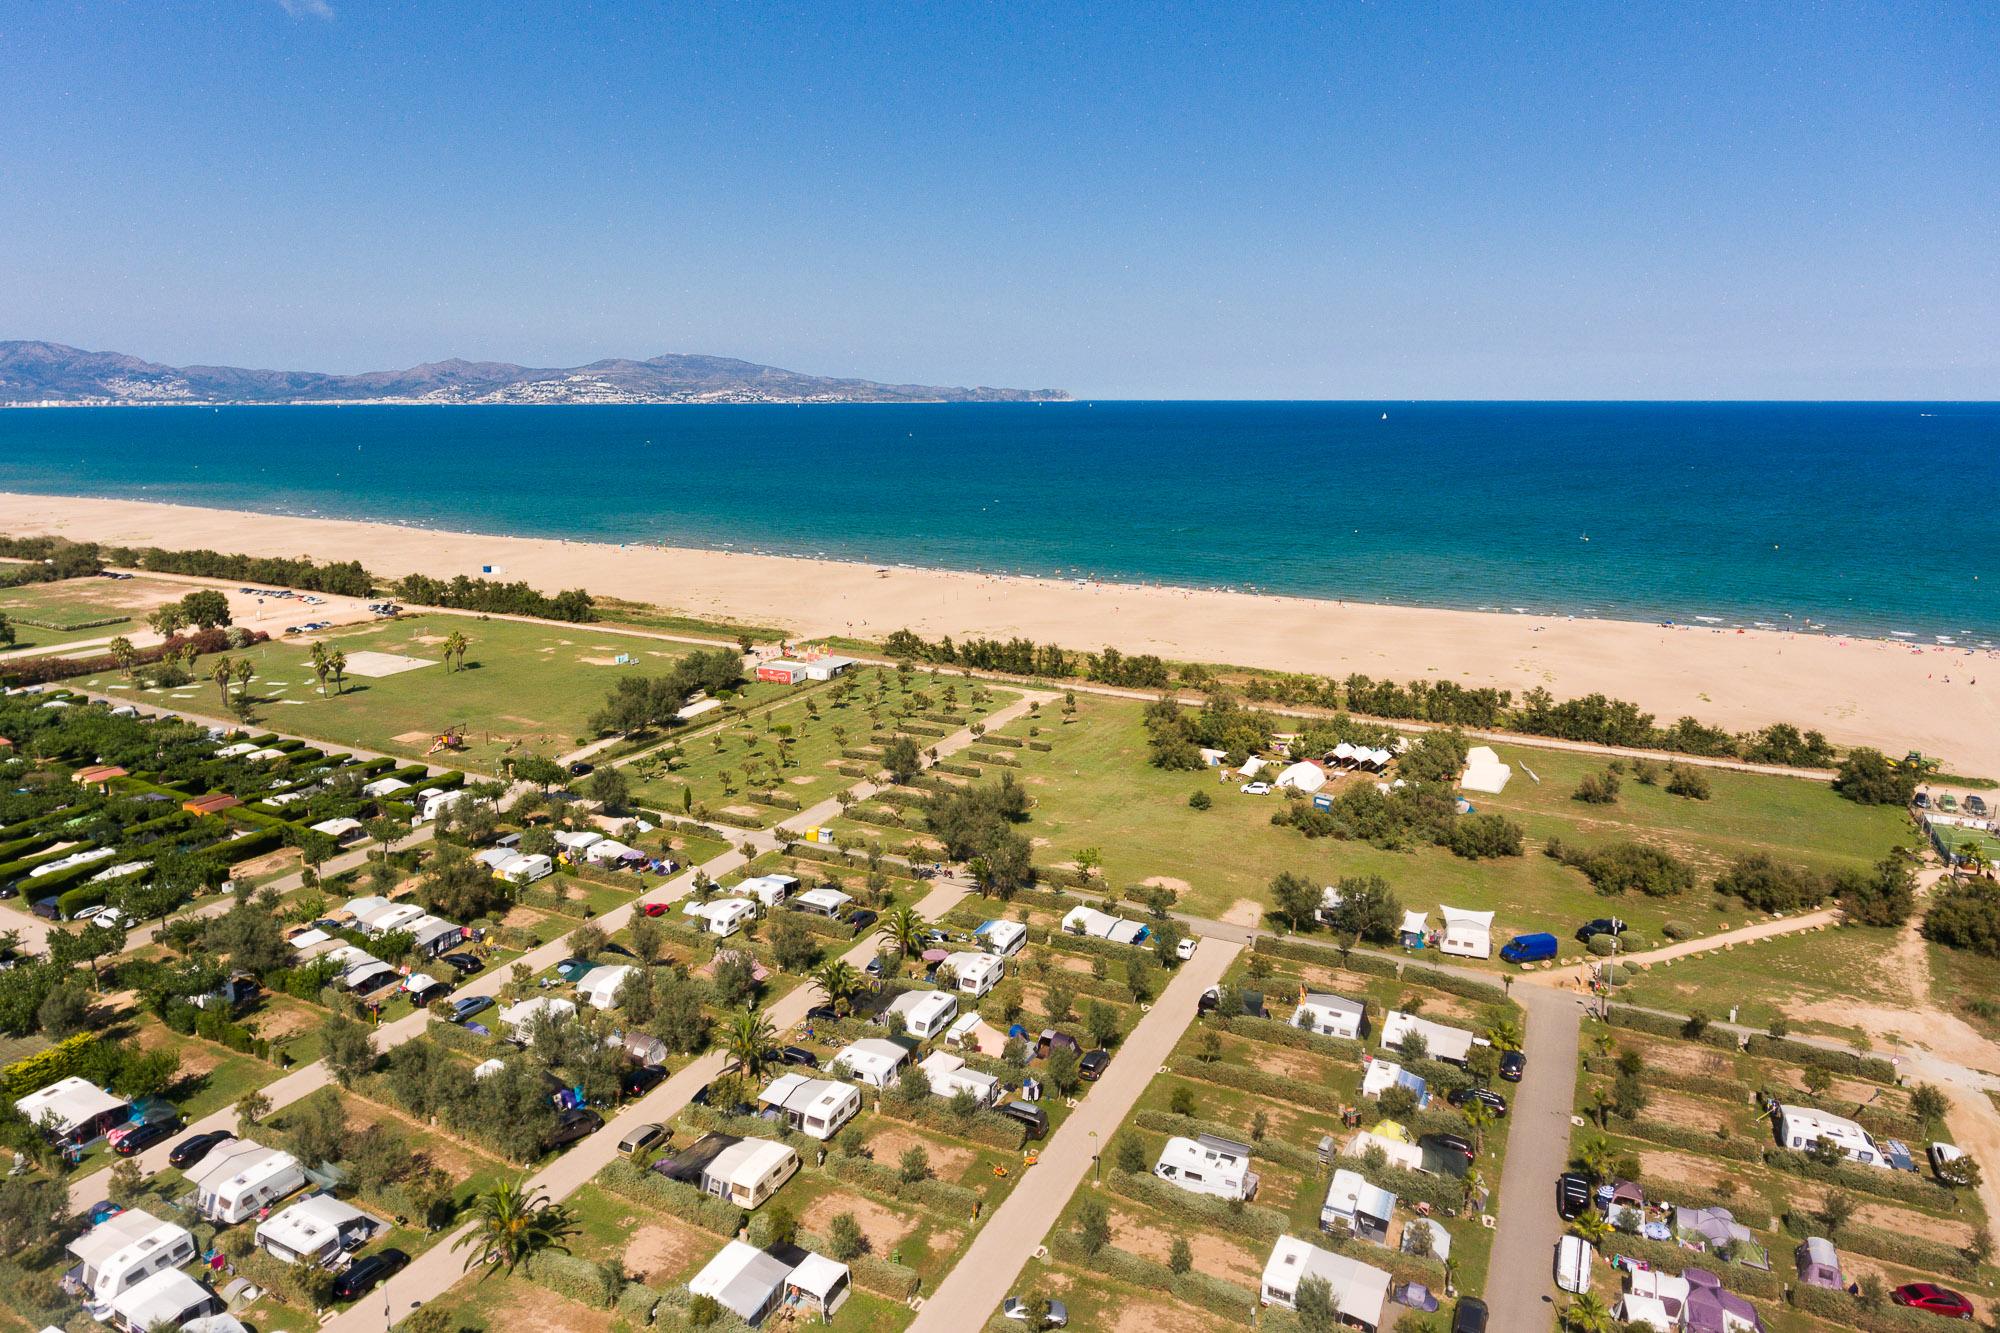 Camping Costa Brava direct access to the beach | Amfora